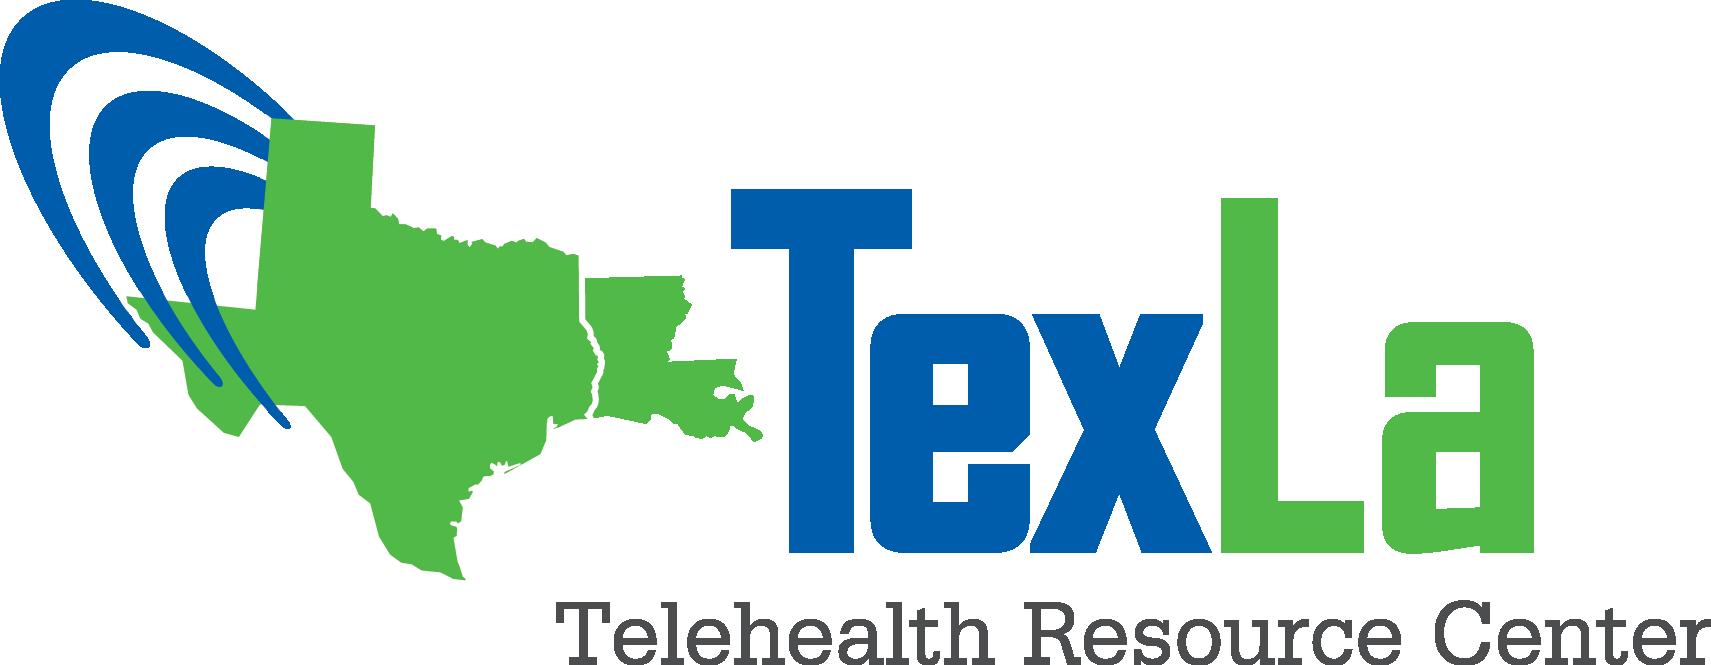 TexLa Telehealth Resource Center.png